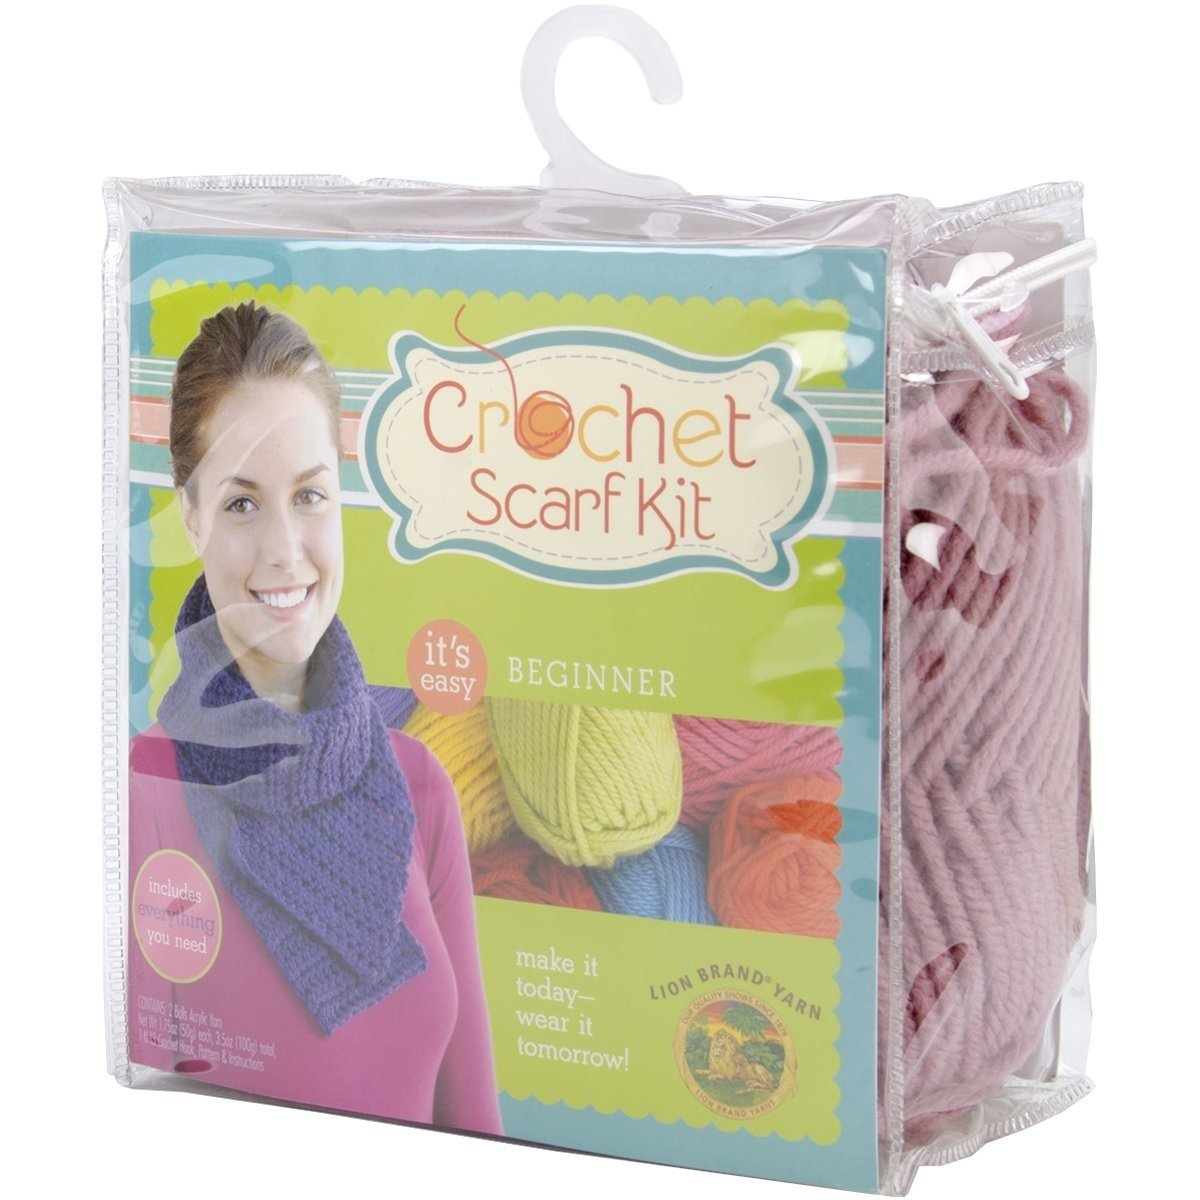 Lion Brand Yarn 600-885 Beginner Crochet Scarf Kit, Dusty Rose